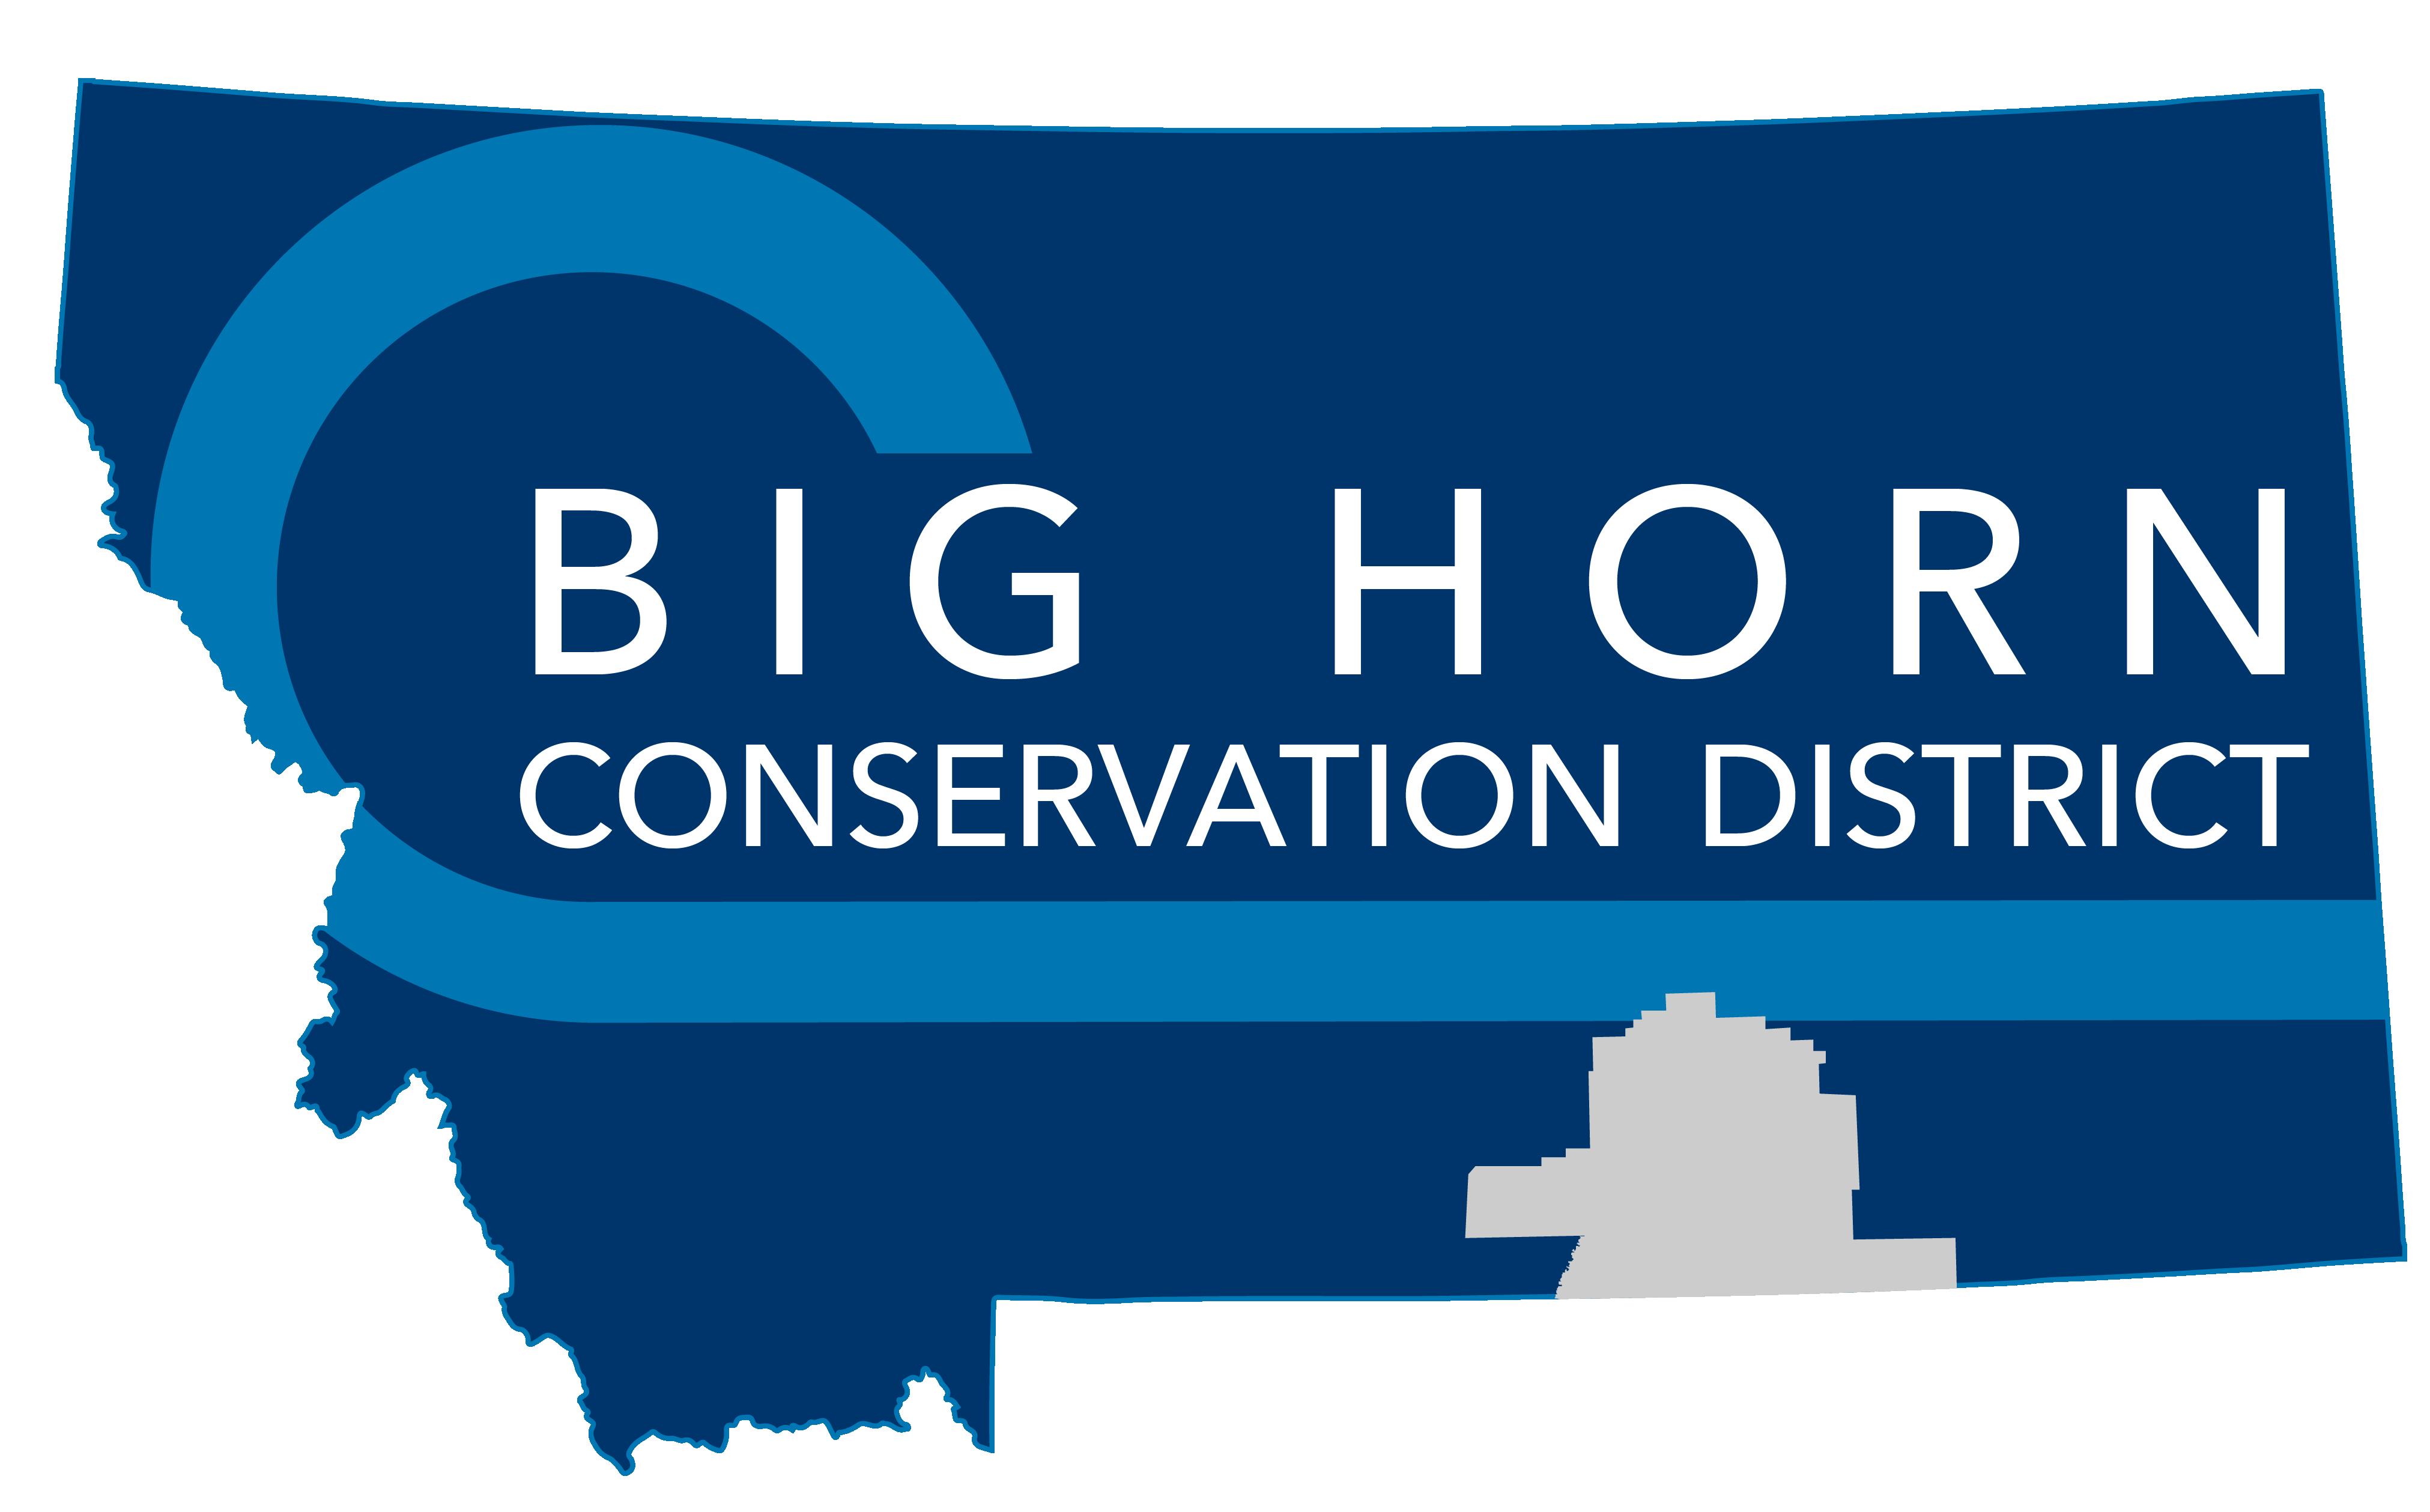 Big Horn CD logo